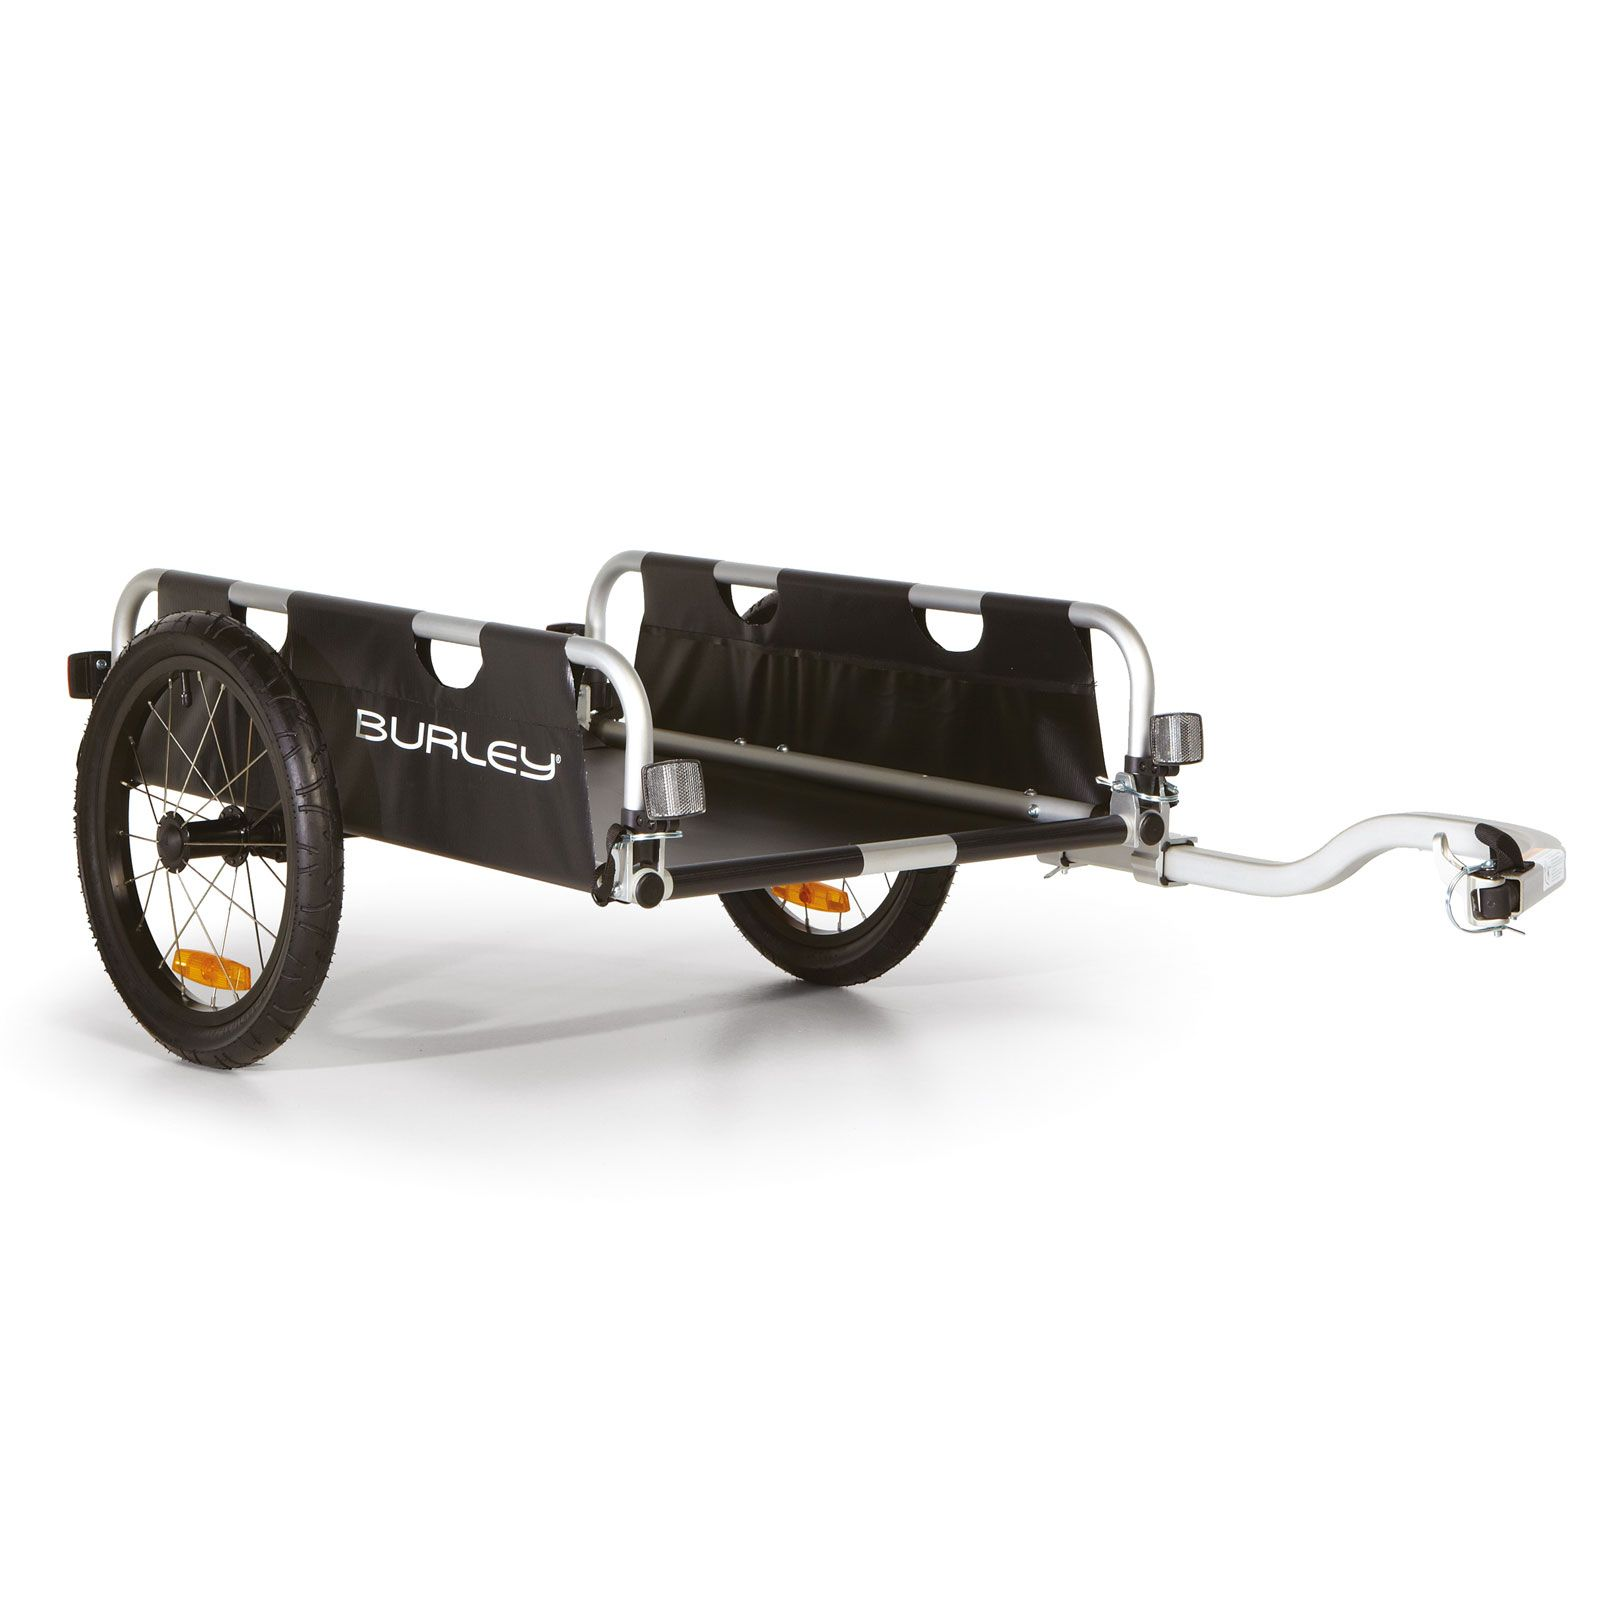 Burley Flatbed™ | Fahrrad Lasten Anhänger – Die Radanhänger